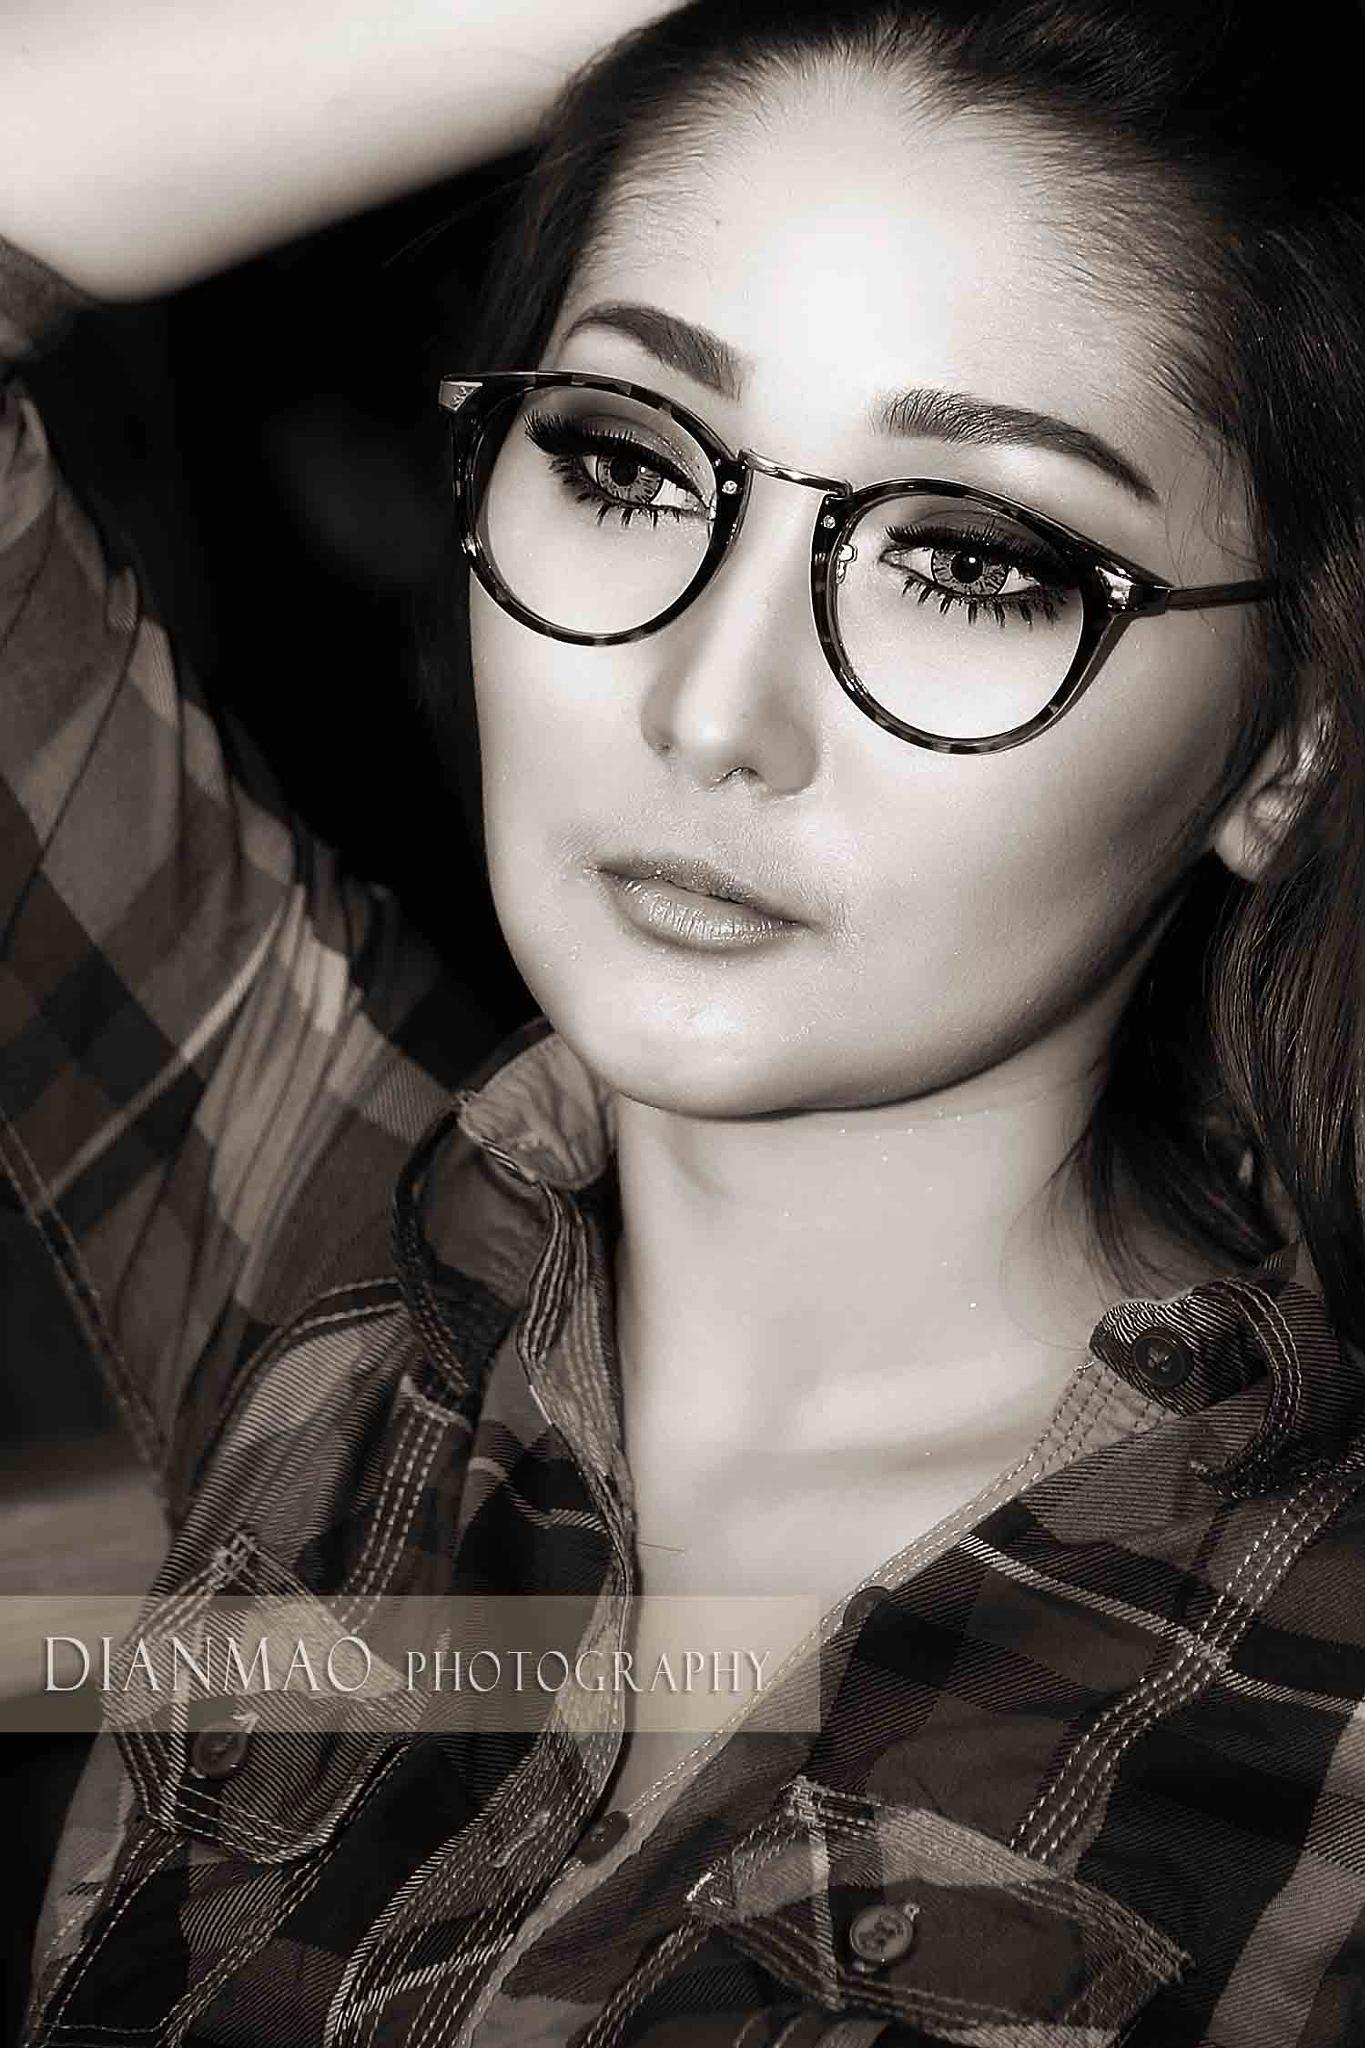 beauty by dianmao